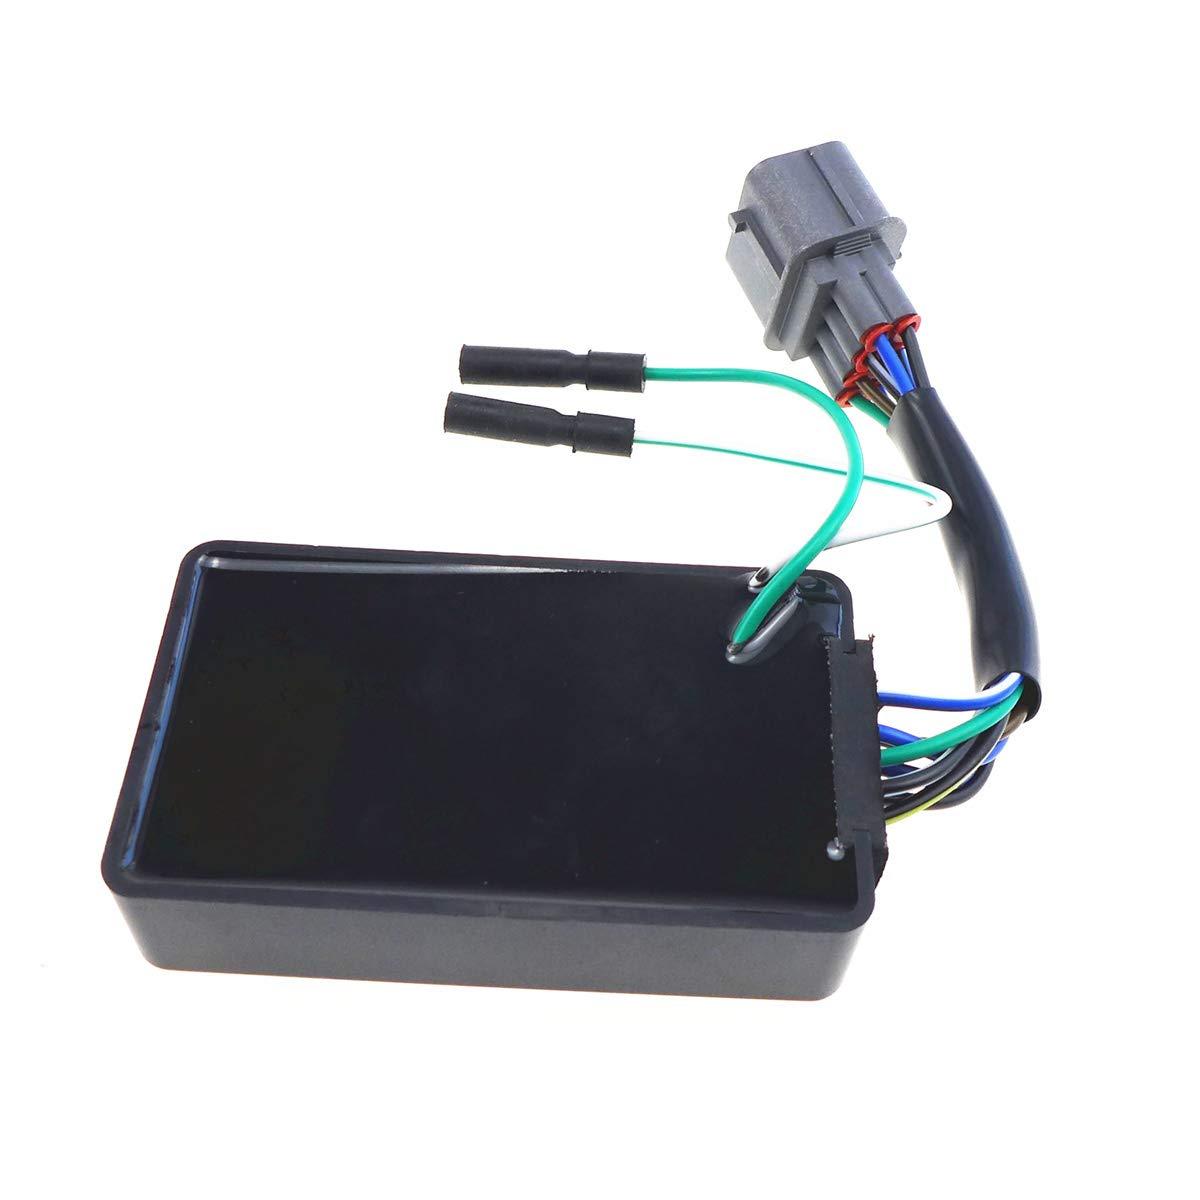 CDI Box for Honda Rancher TRX350FE TRX350FM TRX350TE TRX350TM 2000-2005 30410-HN5-671 30400-HN5-305 30410-HN4-671 30400-HN4-305 30410-HN4-670 30410-HN5-670 30405HN5303 ATV DC Ignition CDI Box